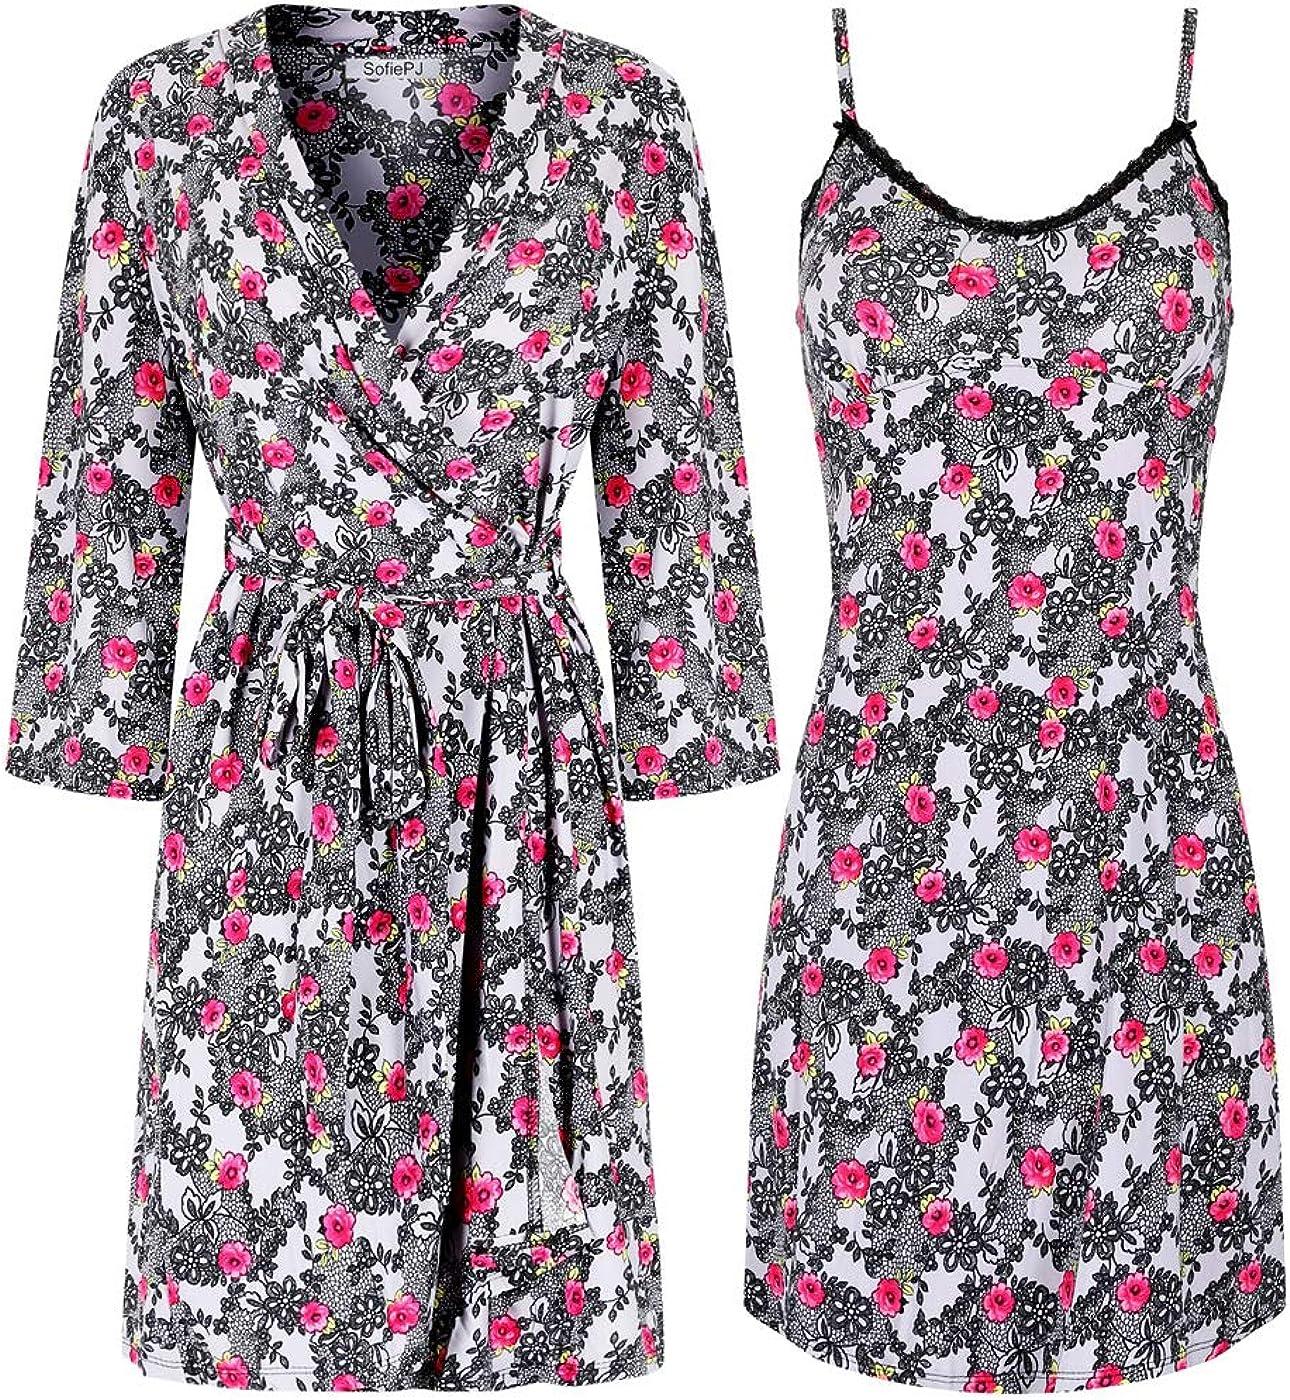 SofiePJ Women's Printed Chemise and Robe 2 Piece Sleep Set 816-MBsLGKL